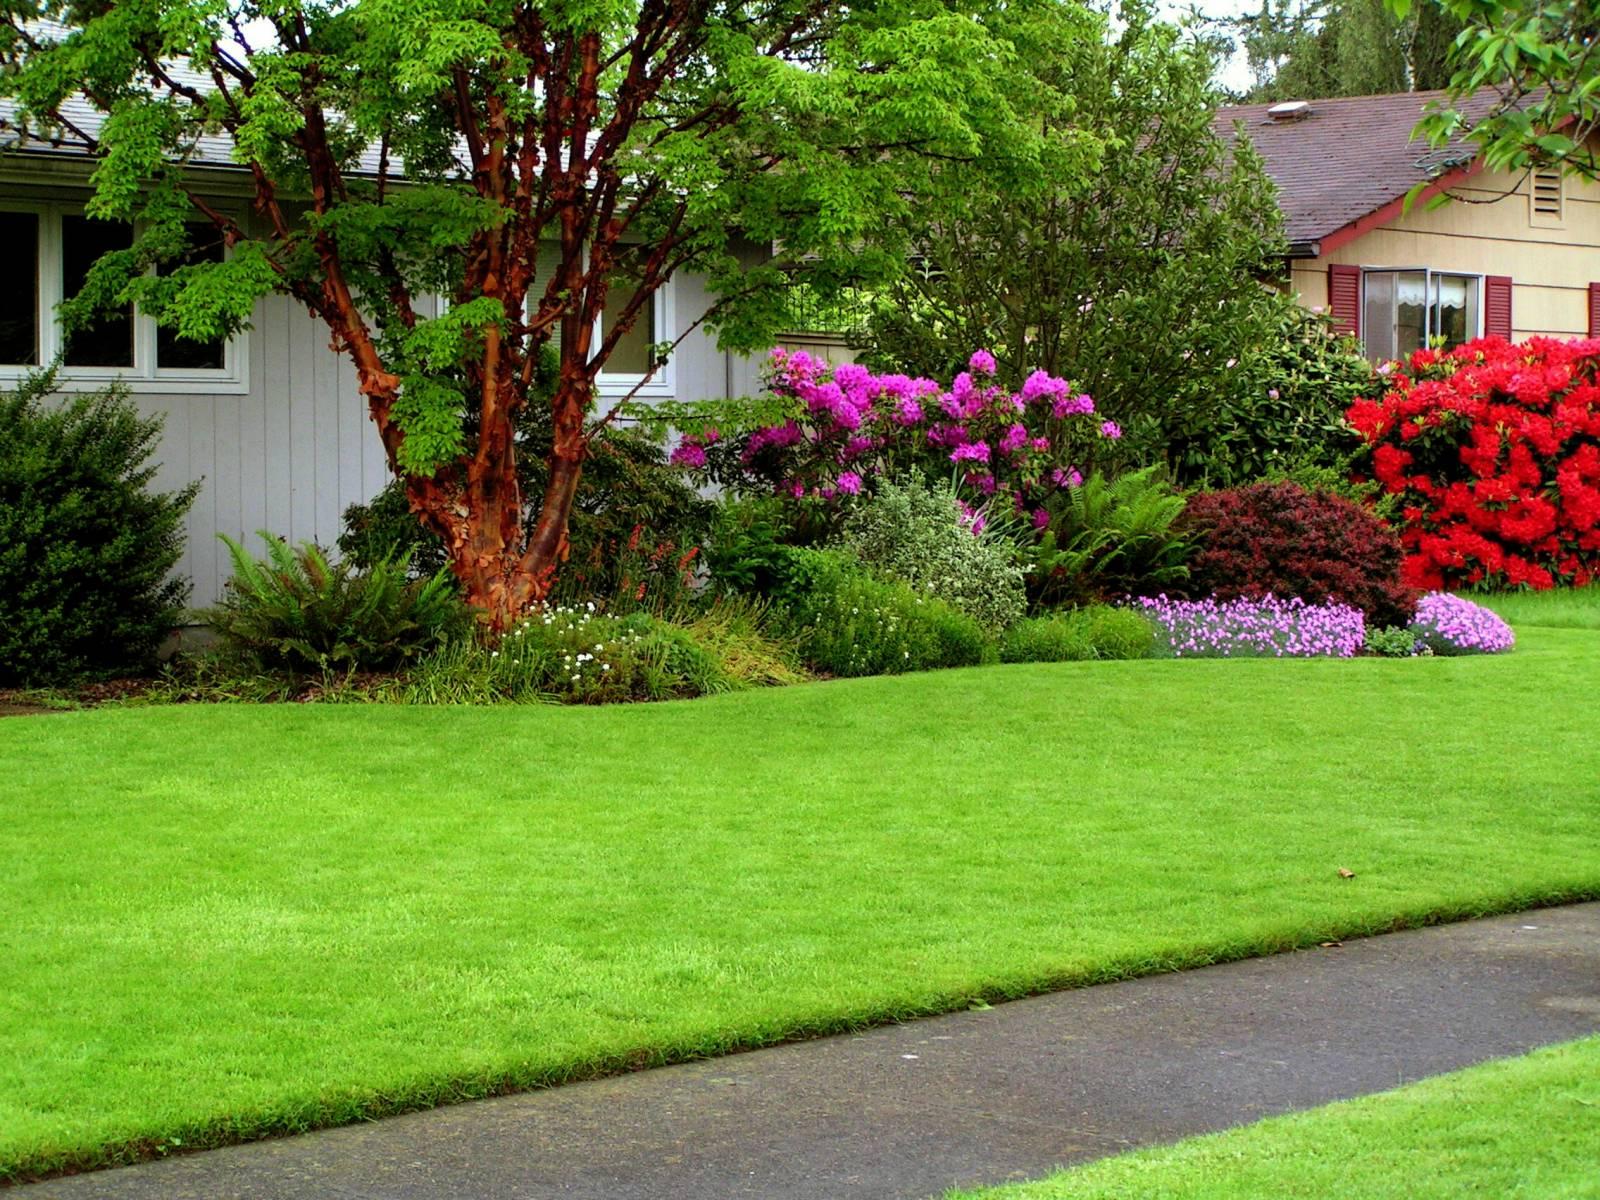 Травянистый газон